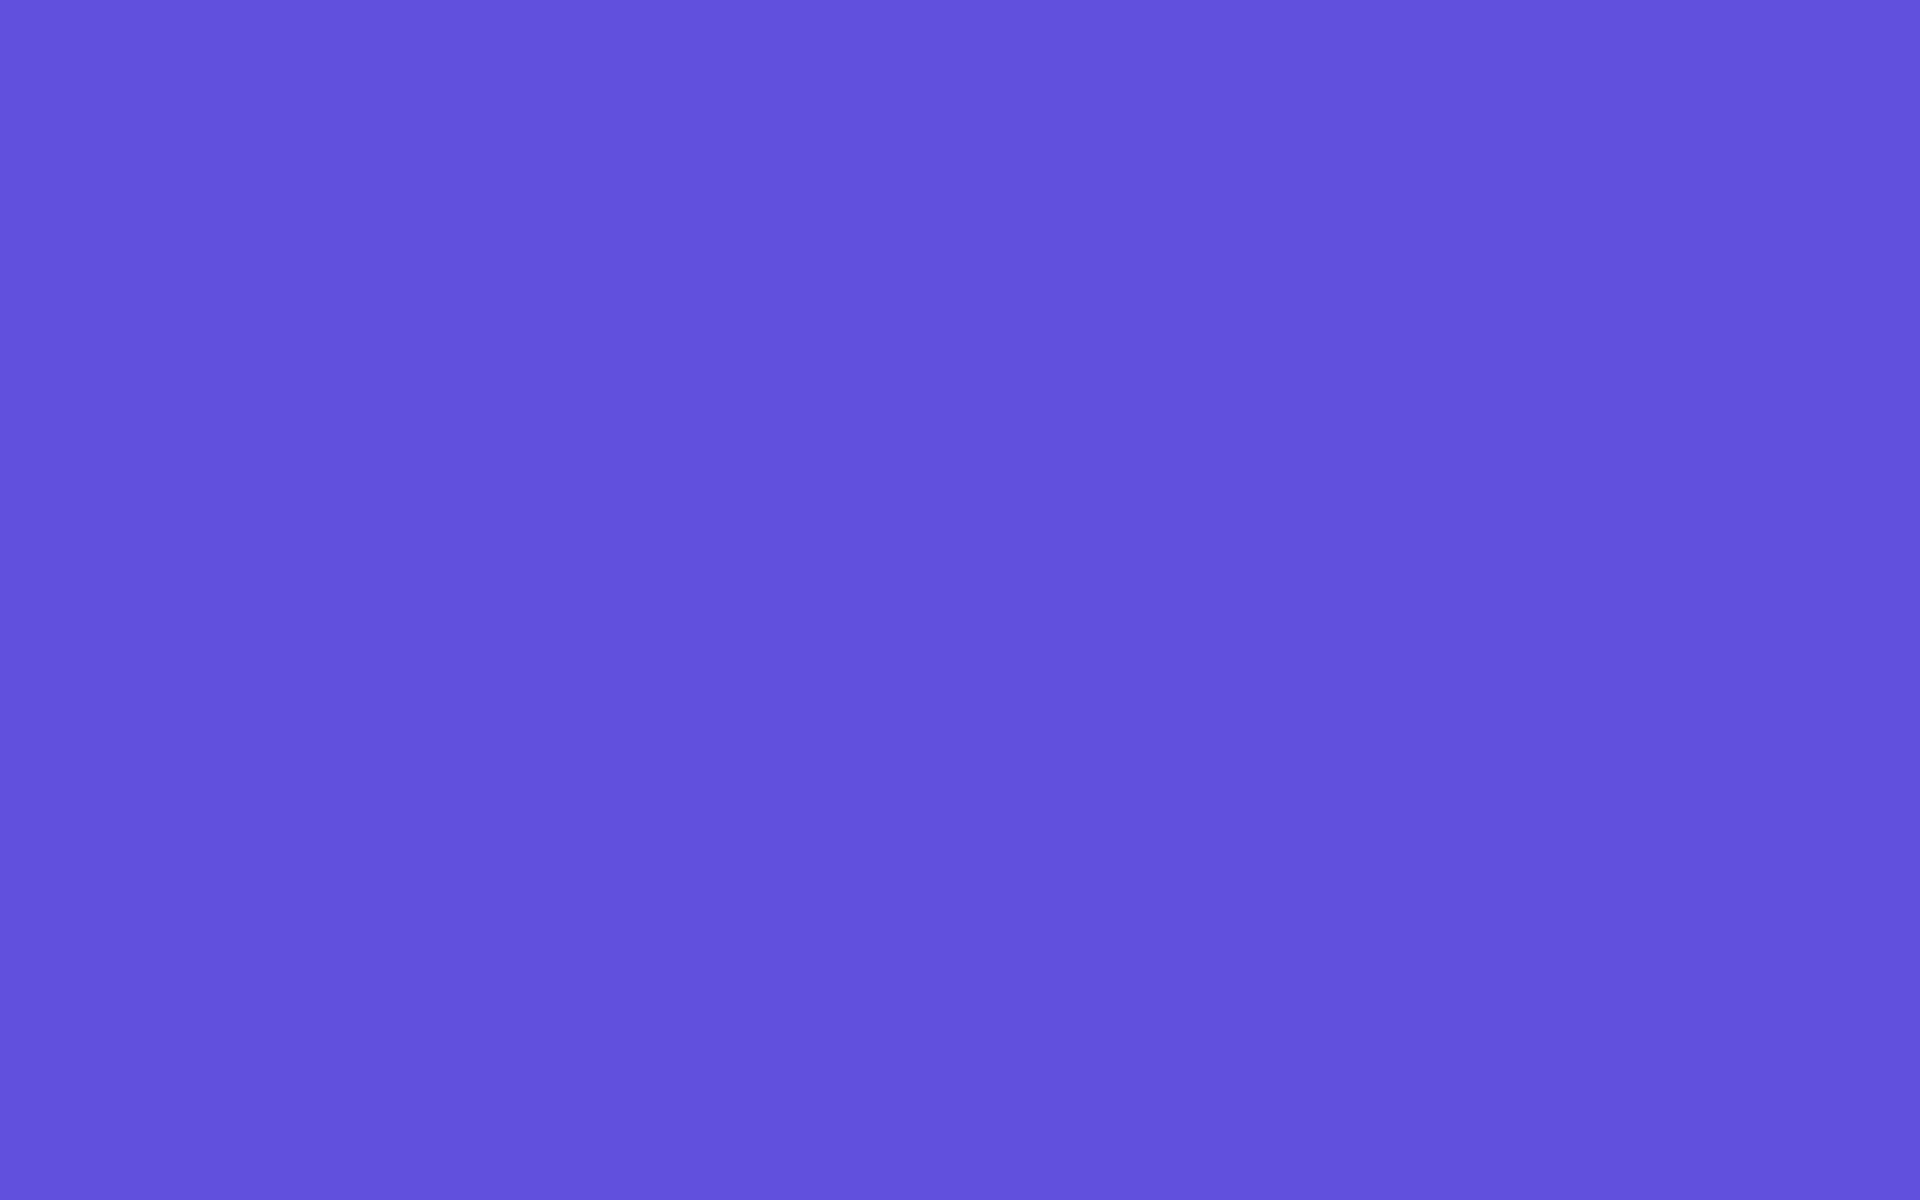 1920x1200 Majorelle Blue Solid Color Background